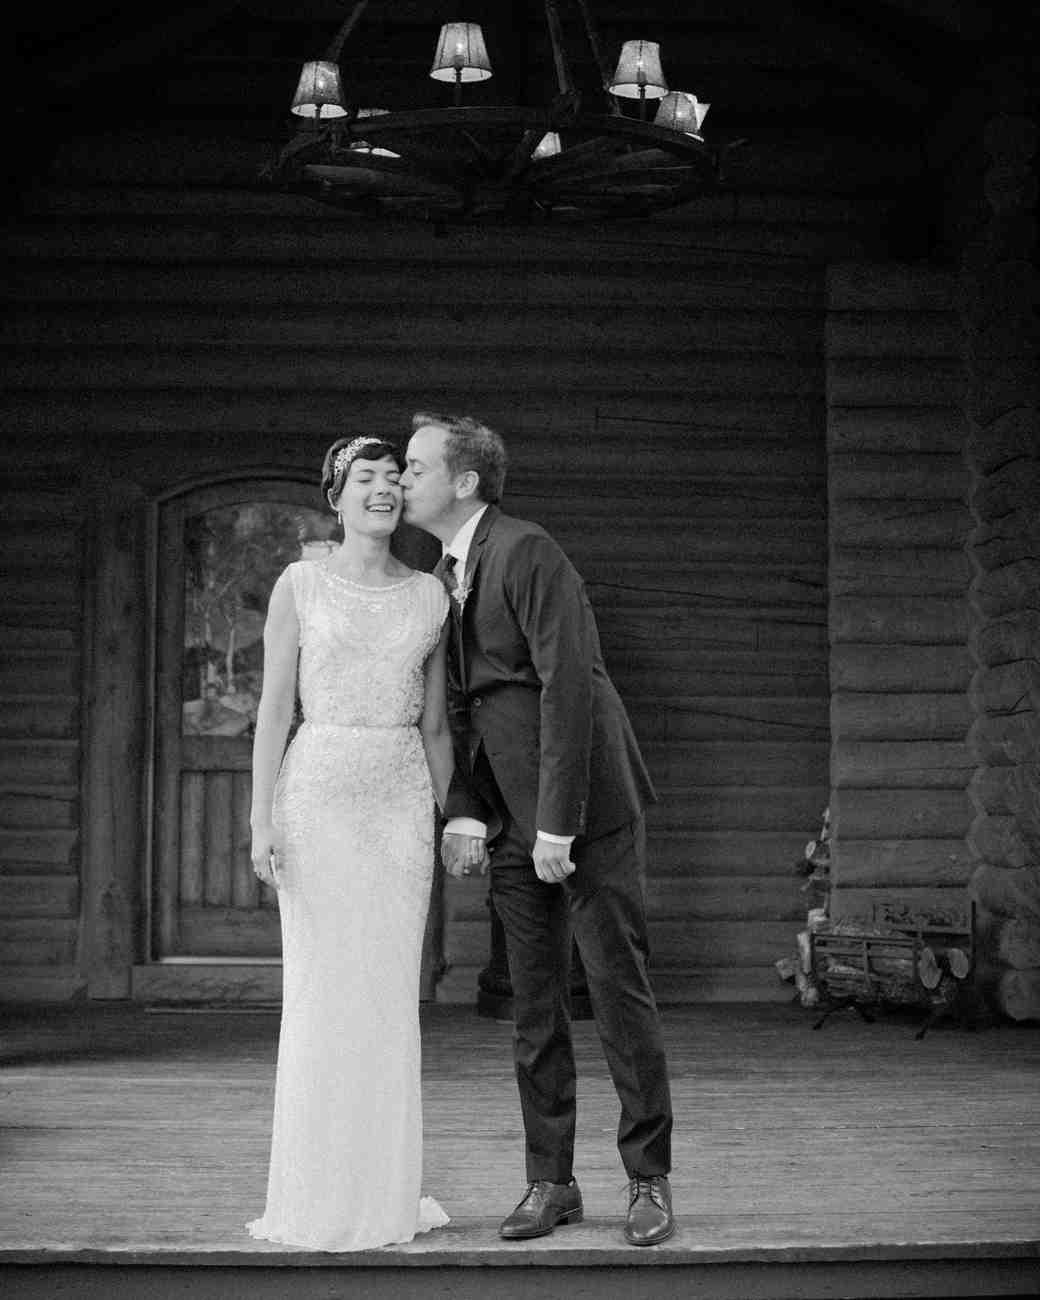 lizzy-pat-wedding-kiss-044-s111777-0115.jpg